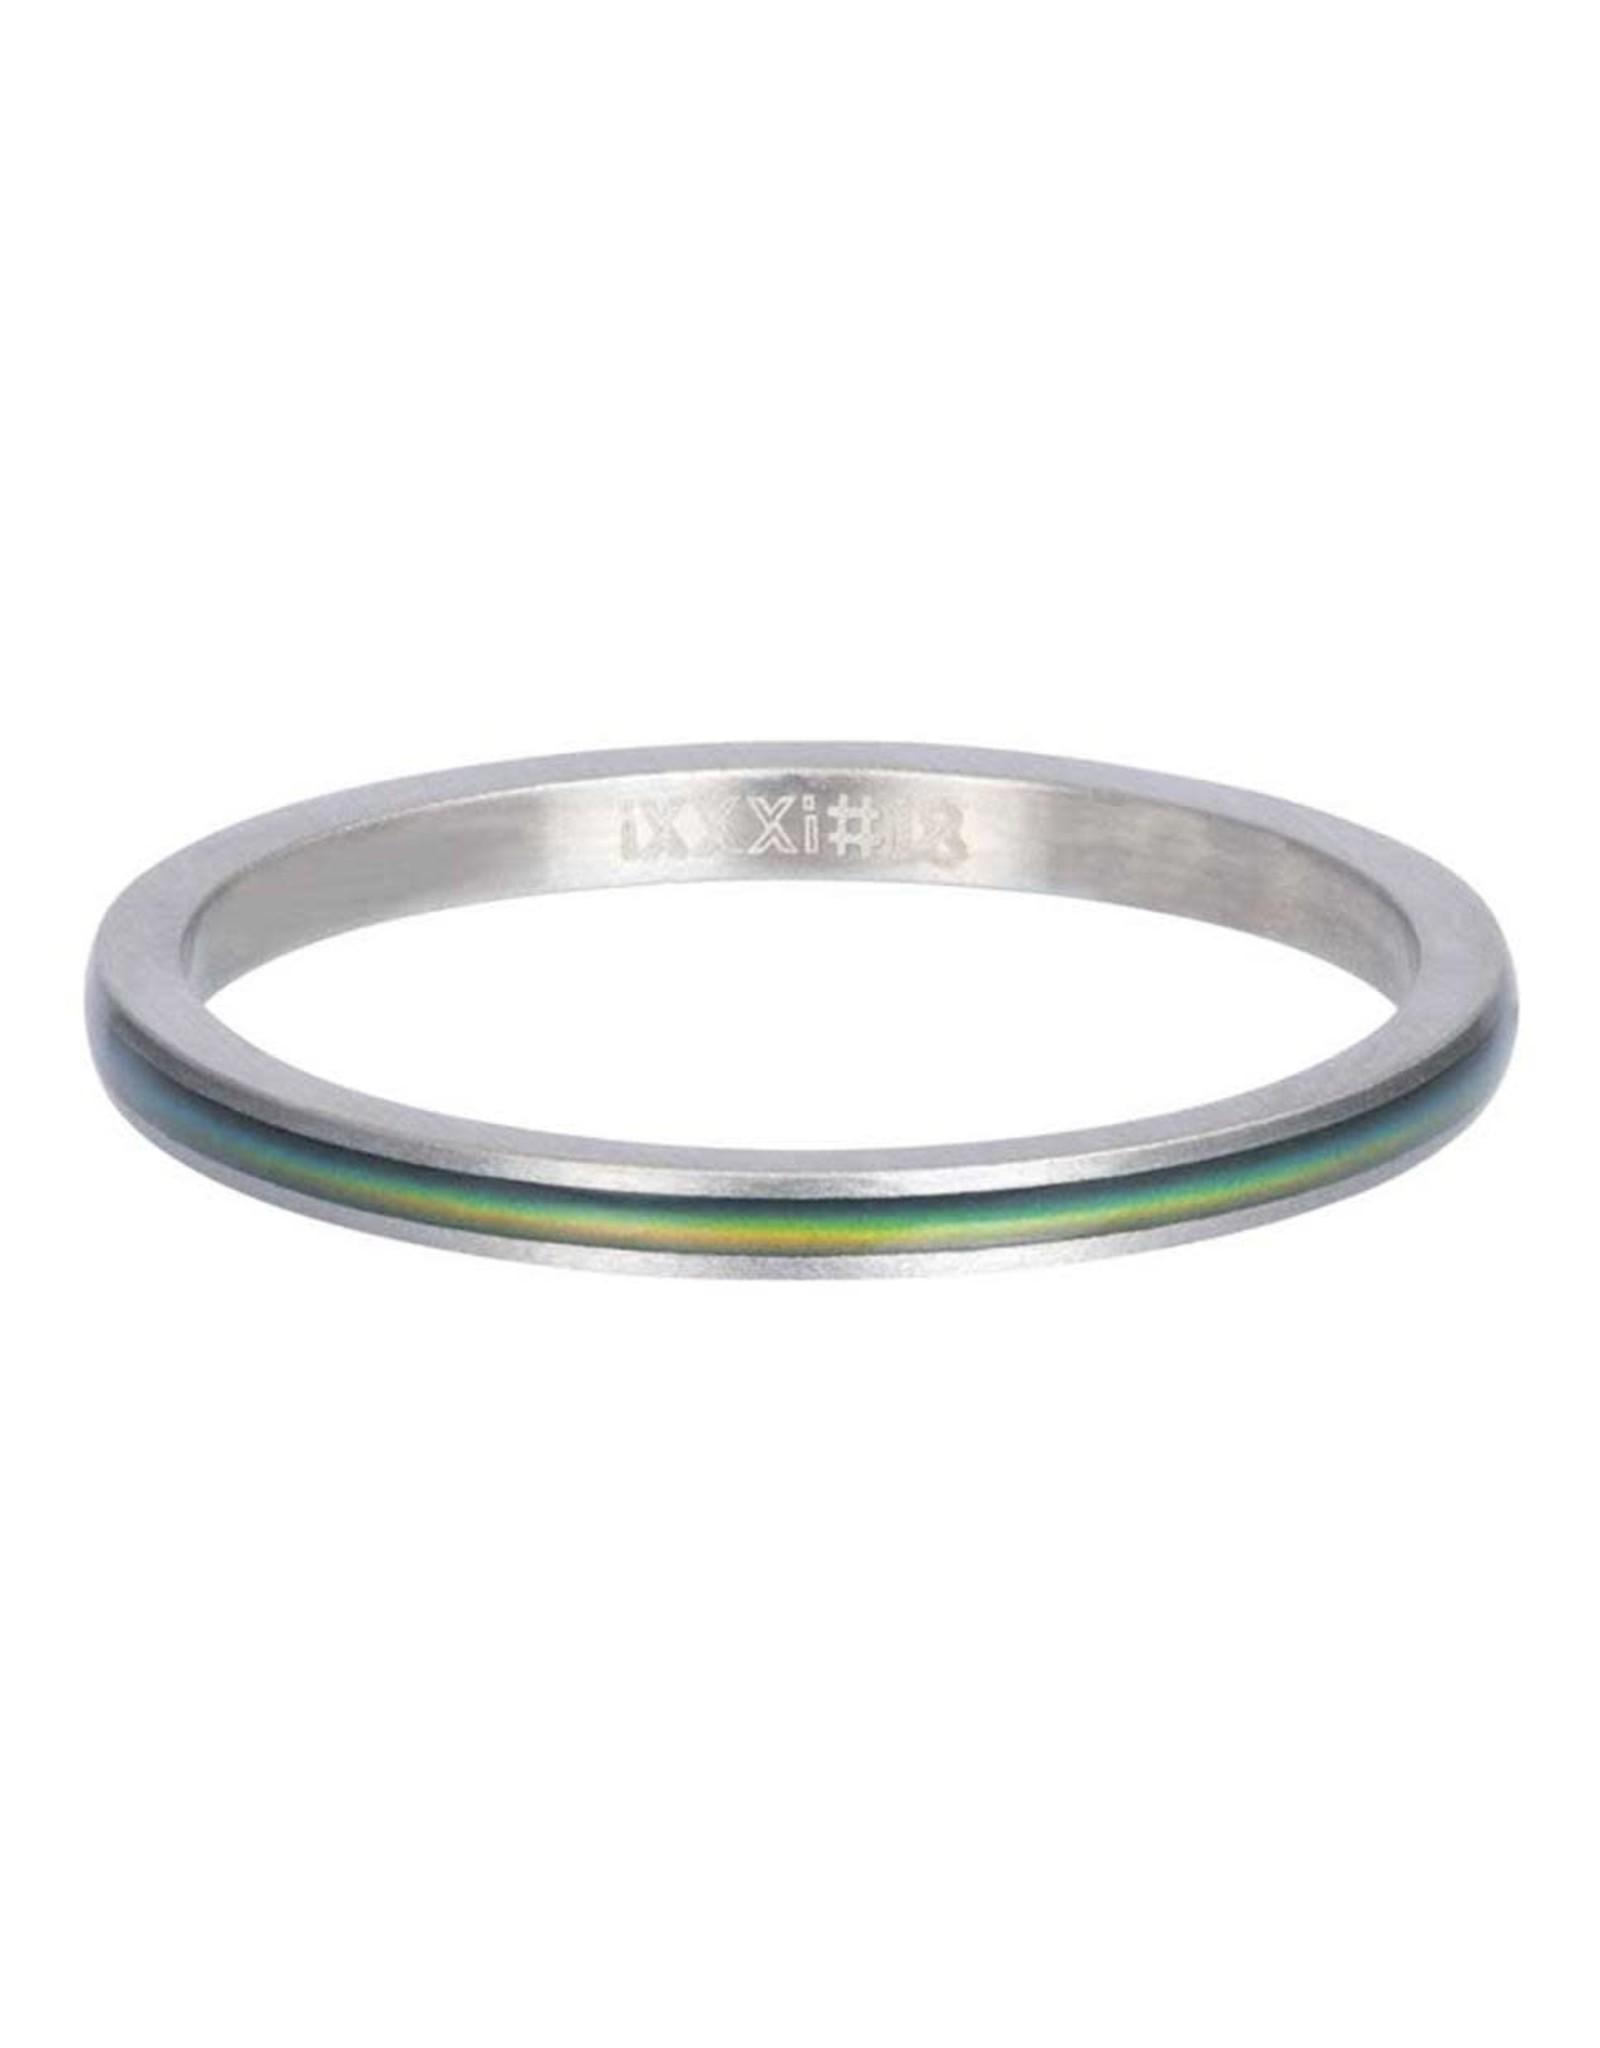 iXXXi Jewelry iXXXi vulring Line Mood